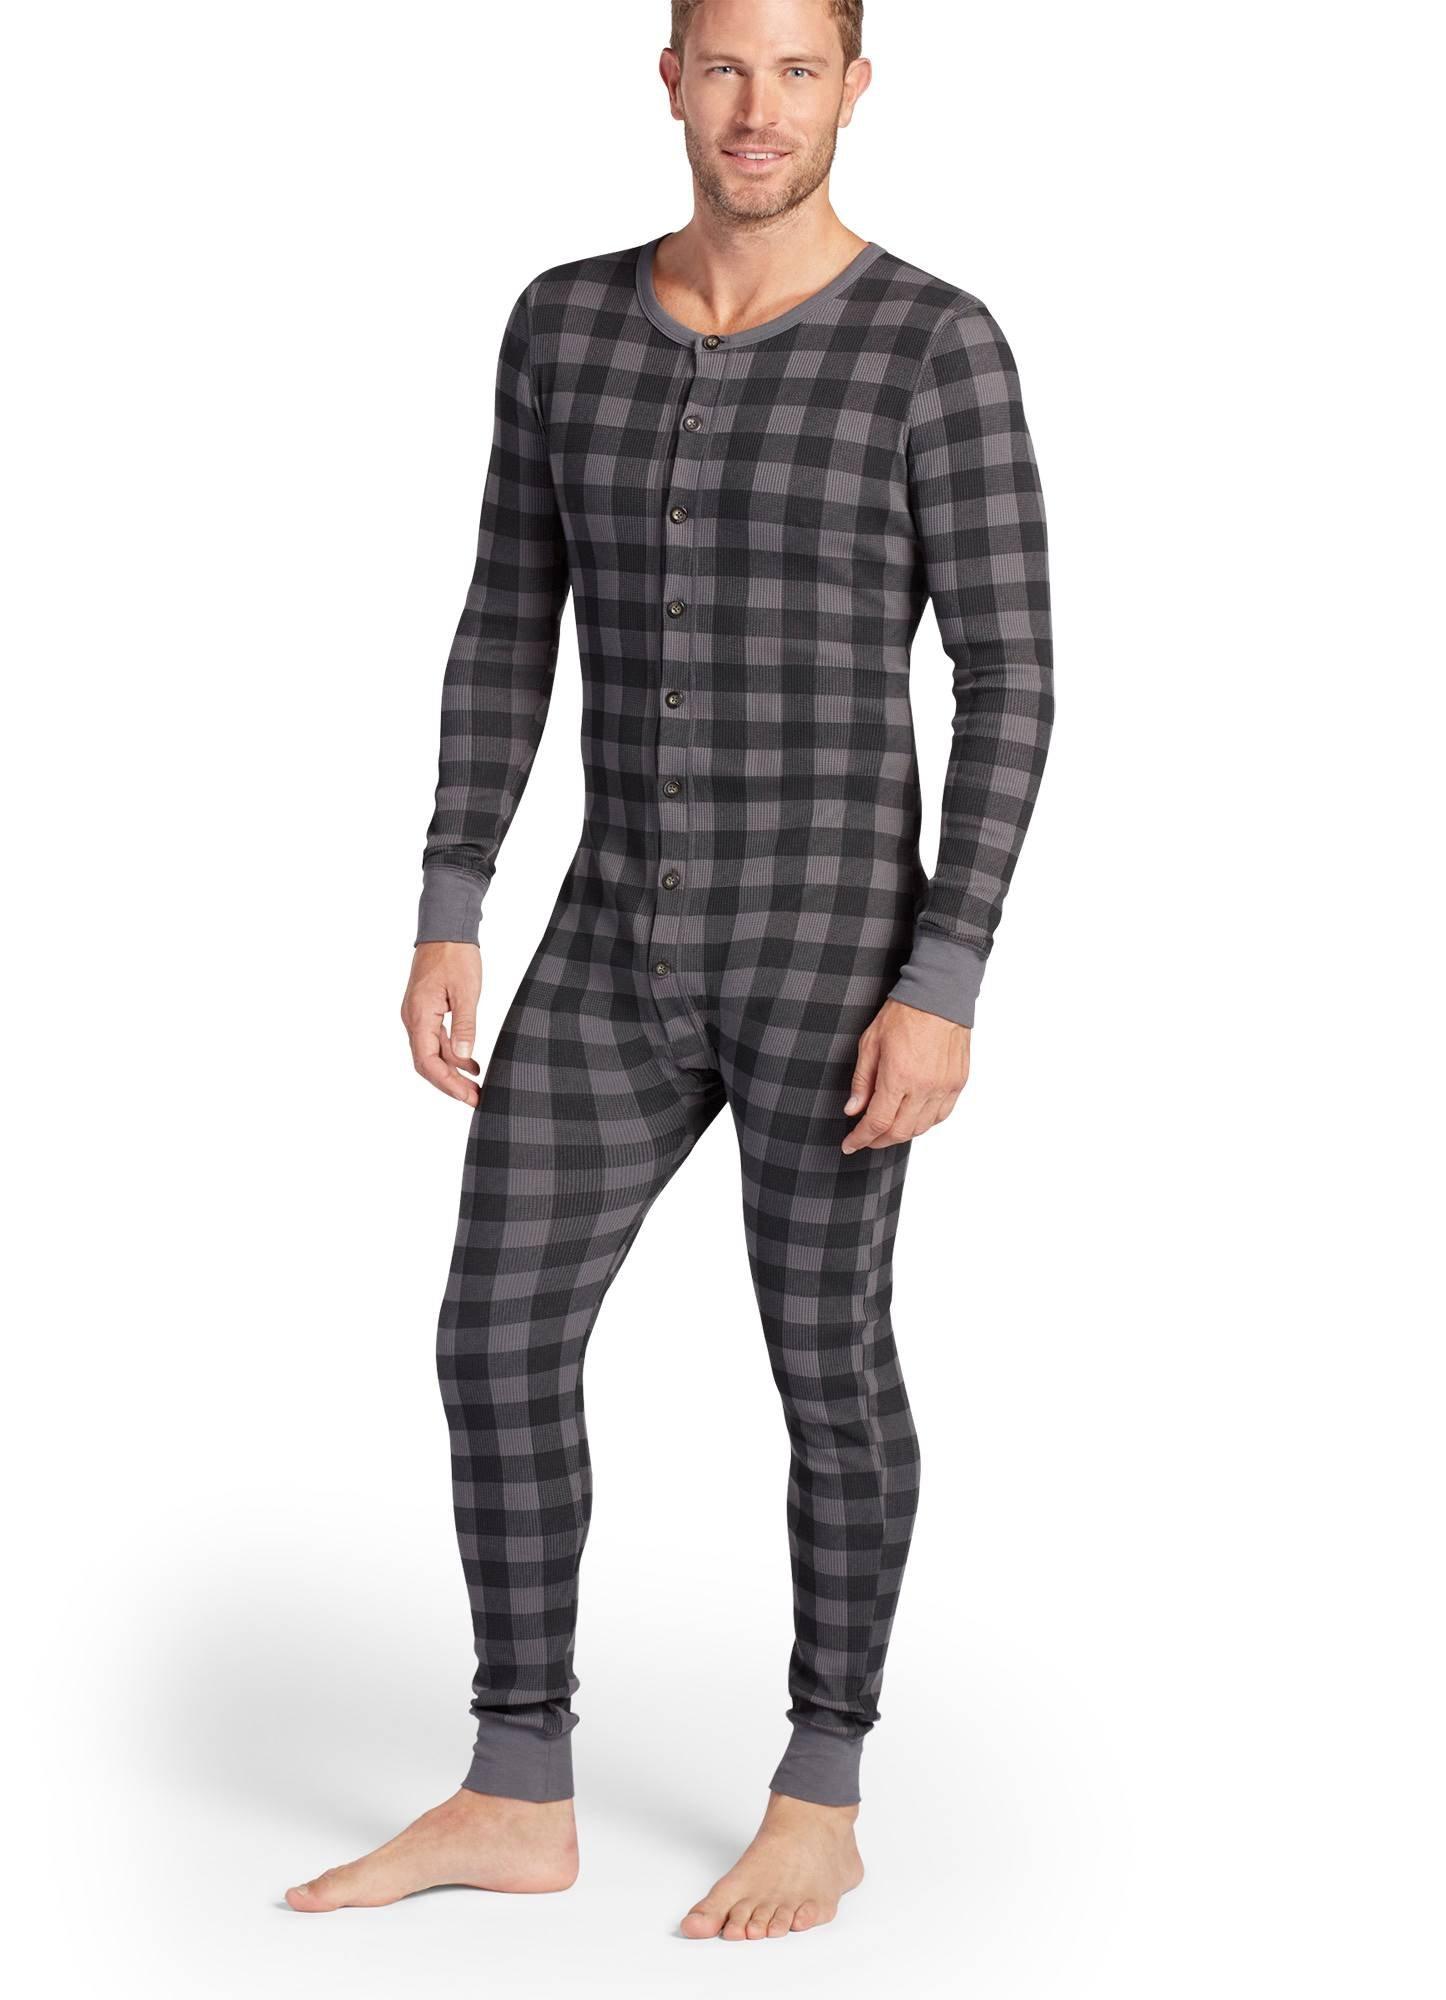 Jockey Men's Sleepwear Waffle Union Suit, Grey Check, XL